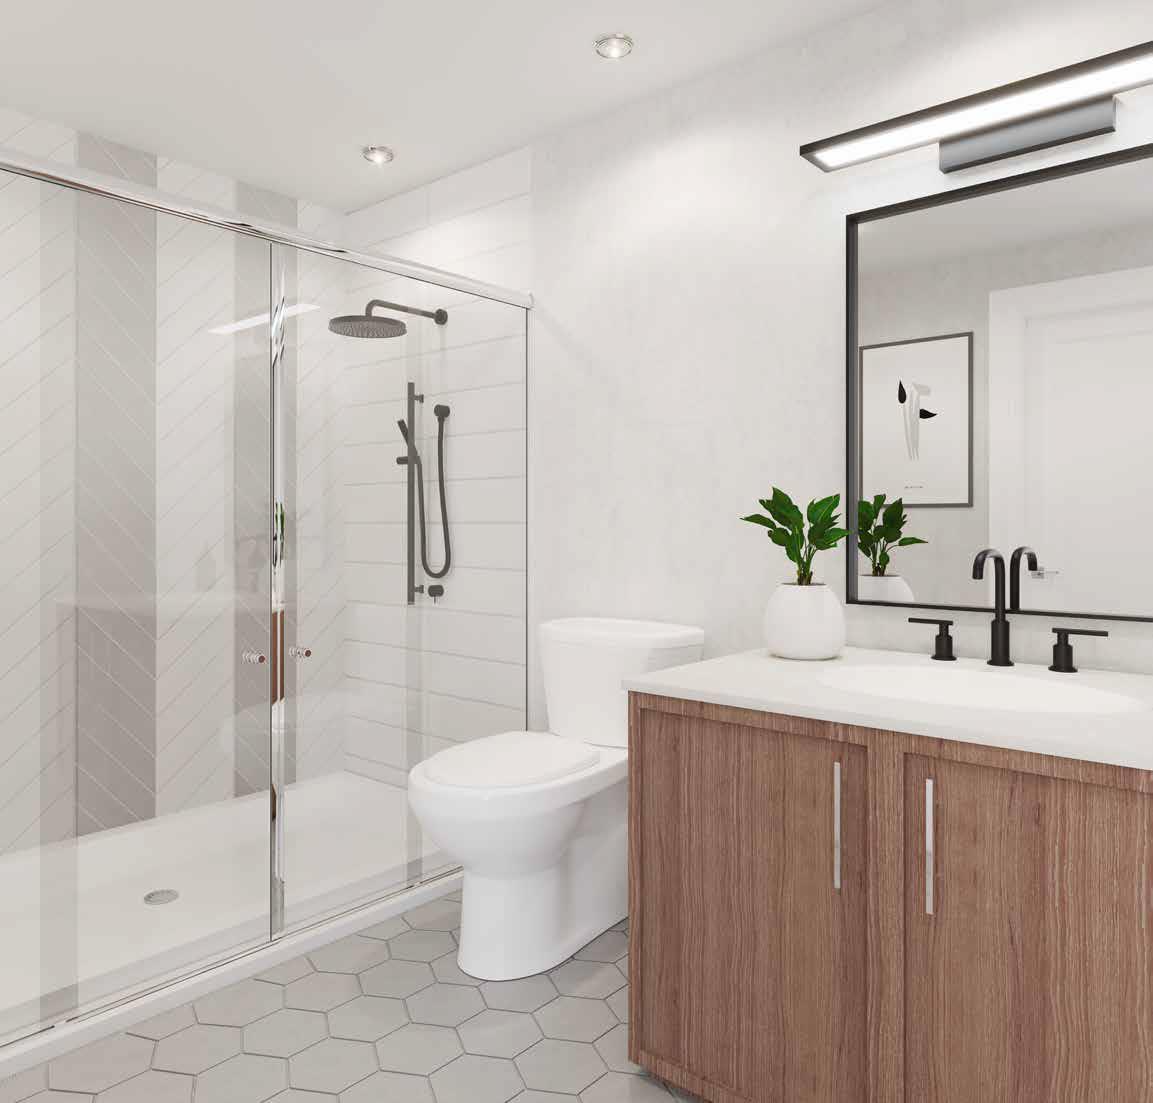 Rendering of Maxx Urban Towns bathroom